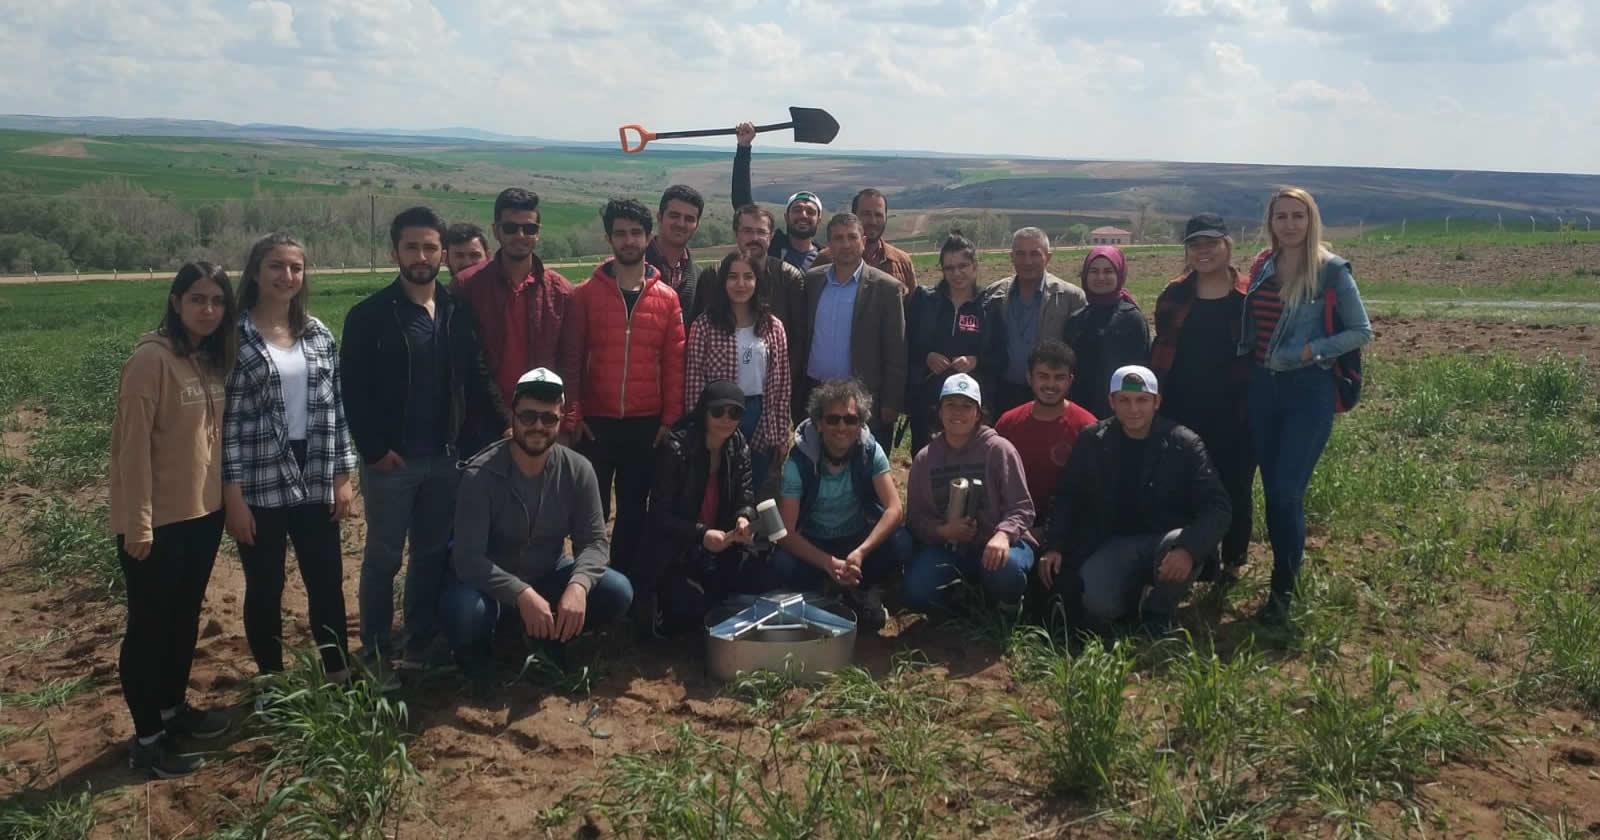 Post of the month 09/2020: FIRElinks activities in Turkey